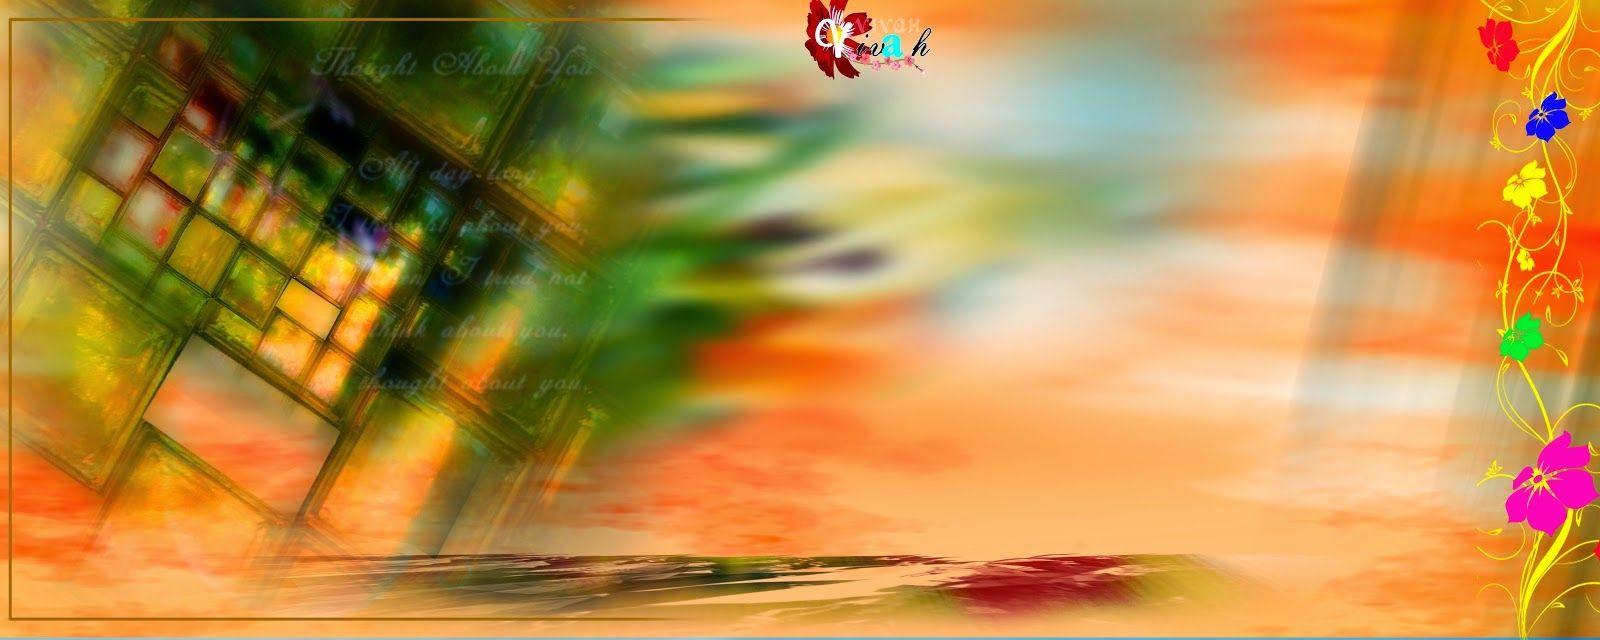 Karizma album hd joy studio design gallery best design - Marriage Photo Album Psd 12x18 Download Luckystudio4u Pinterest Wedding Background Album Design And Weddings